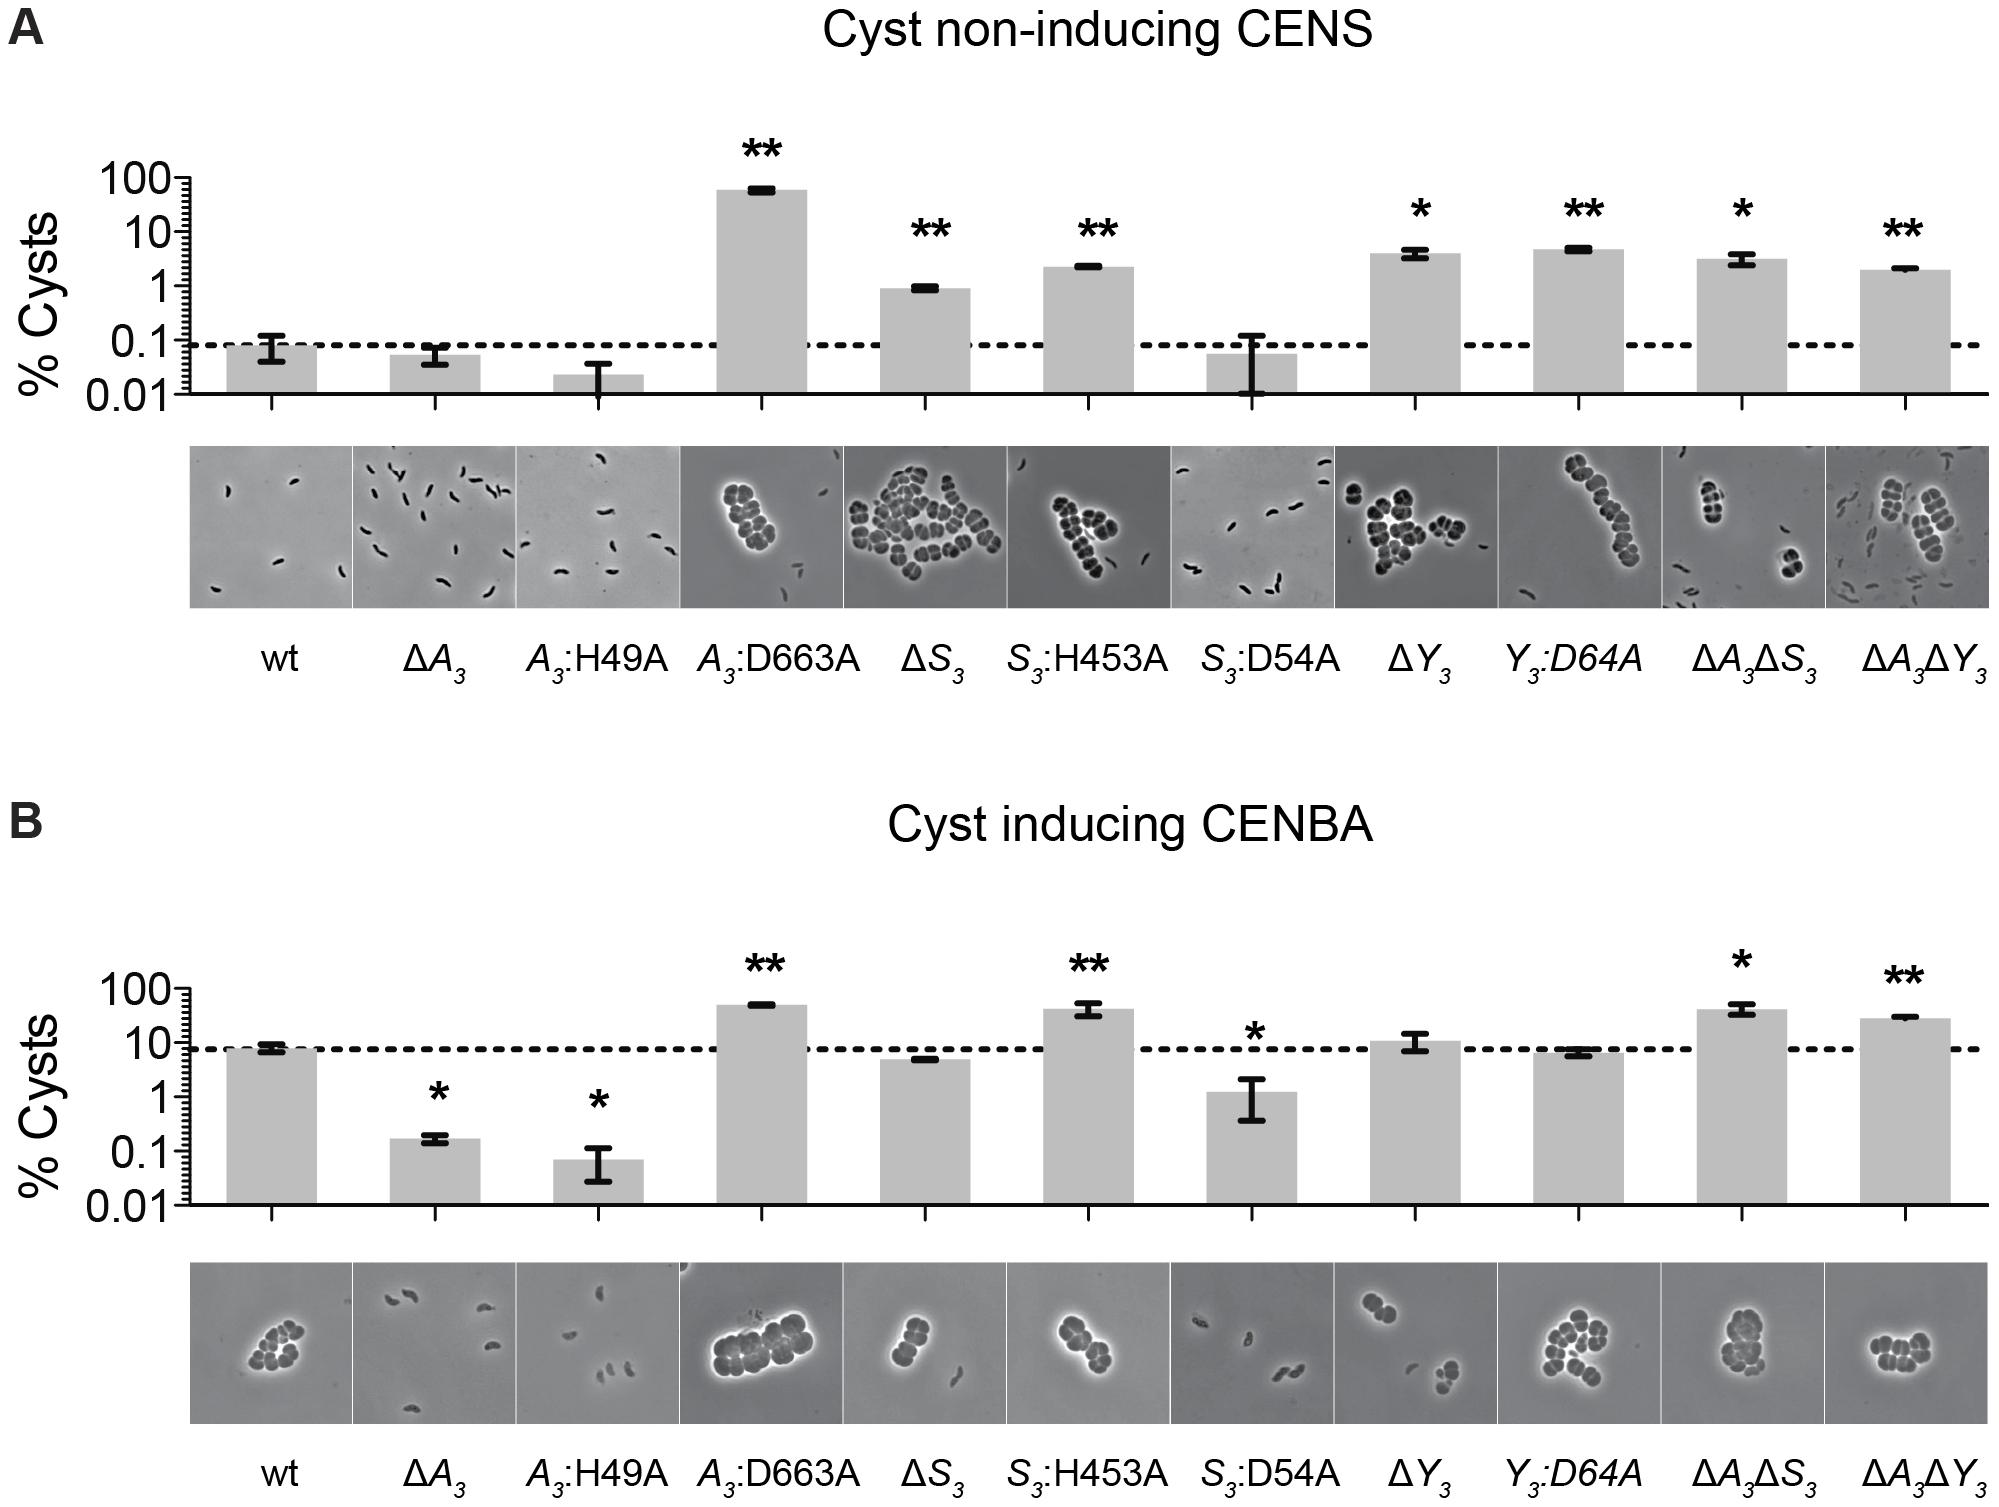 Characterization of <i>cheS<sub>3</sub></i>, <i>cheA<sub>3</sub></i> and <i>cheY<sub>3</sub></i> mutants.